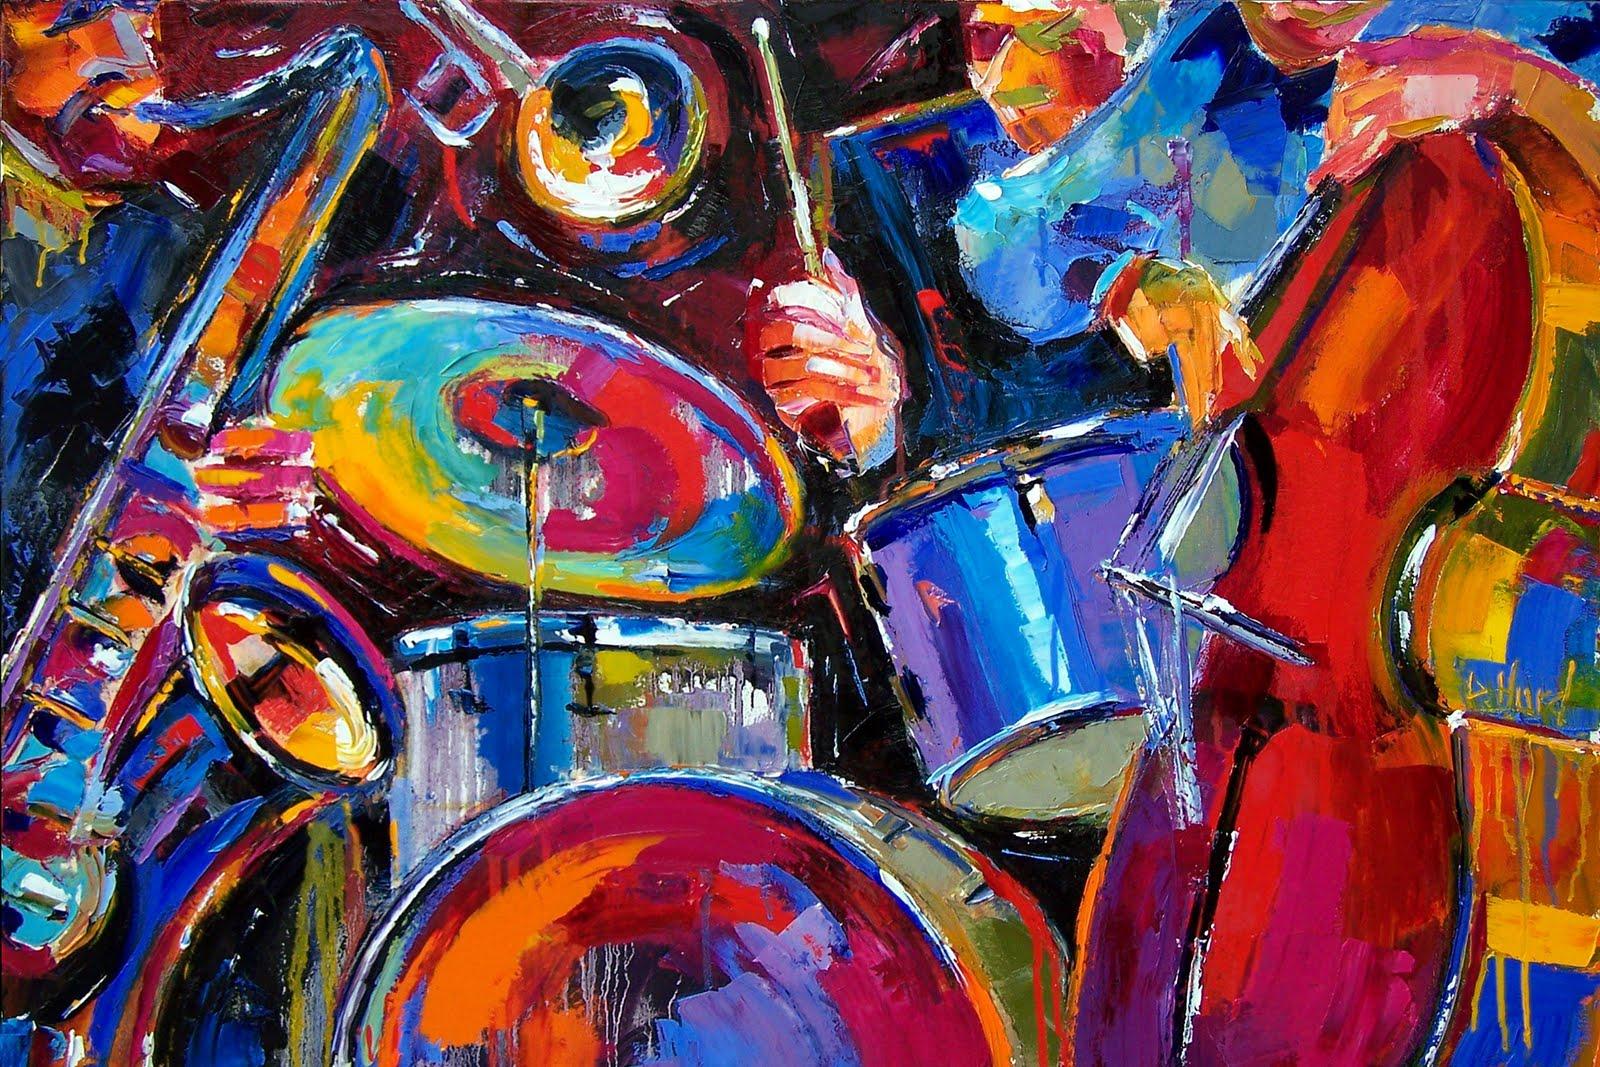 1920x1080 Multicolor Jazz Singer Artwork Desktop Pc And: Jazz Art Wallpaper